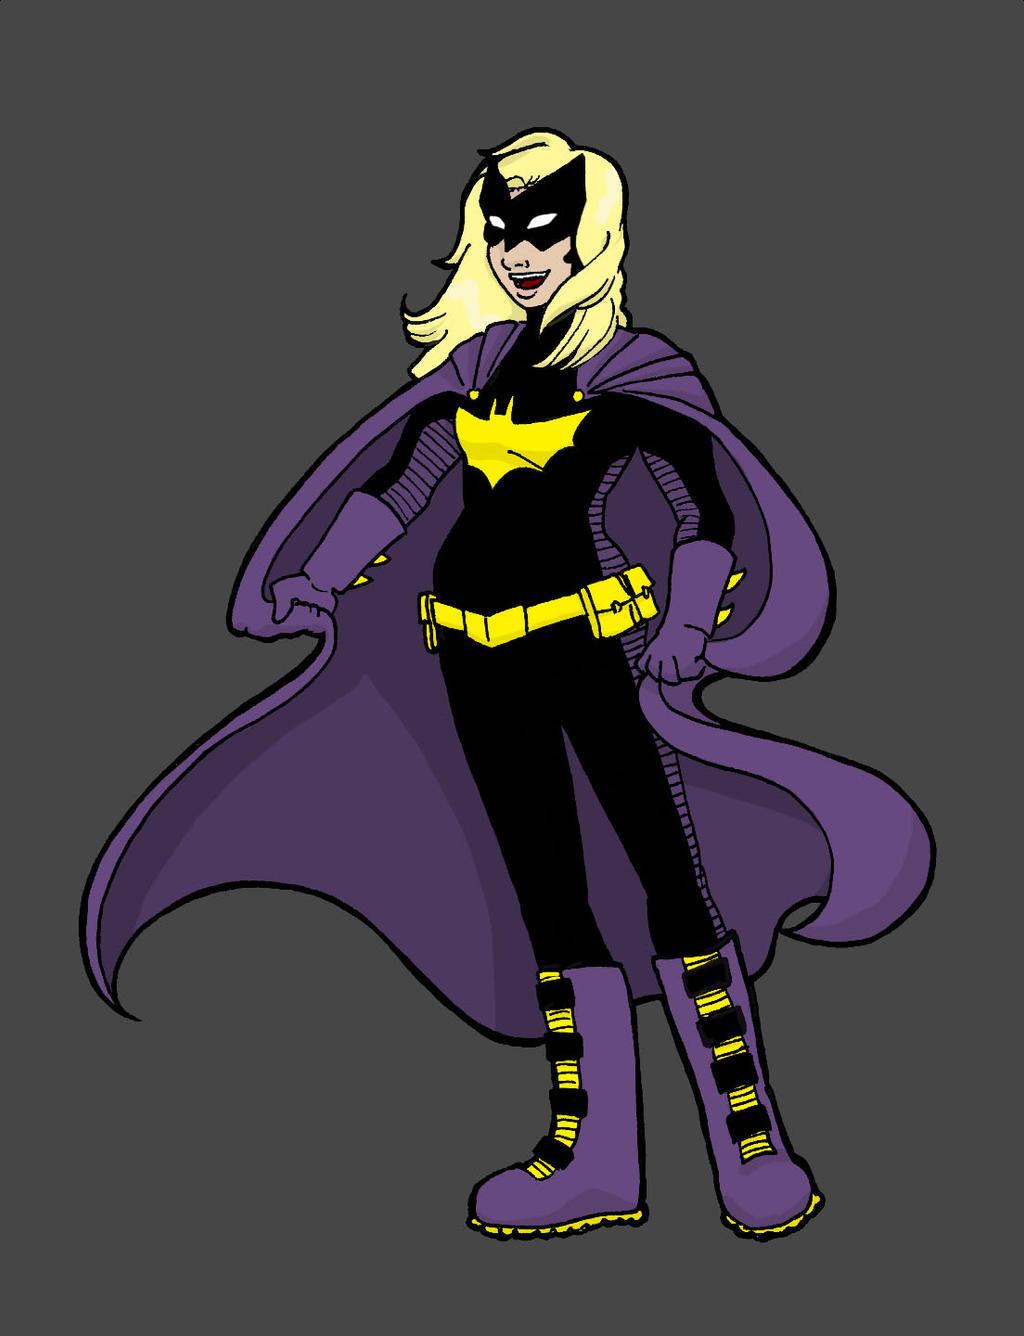 TT Char Ref: Batwoman by YouveGotTaste